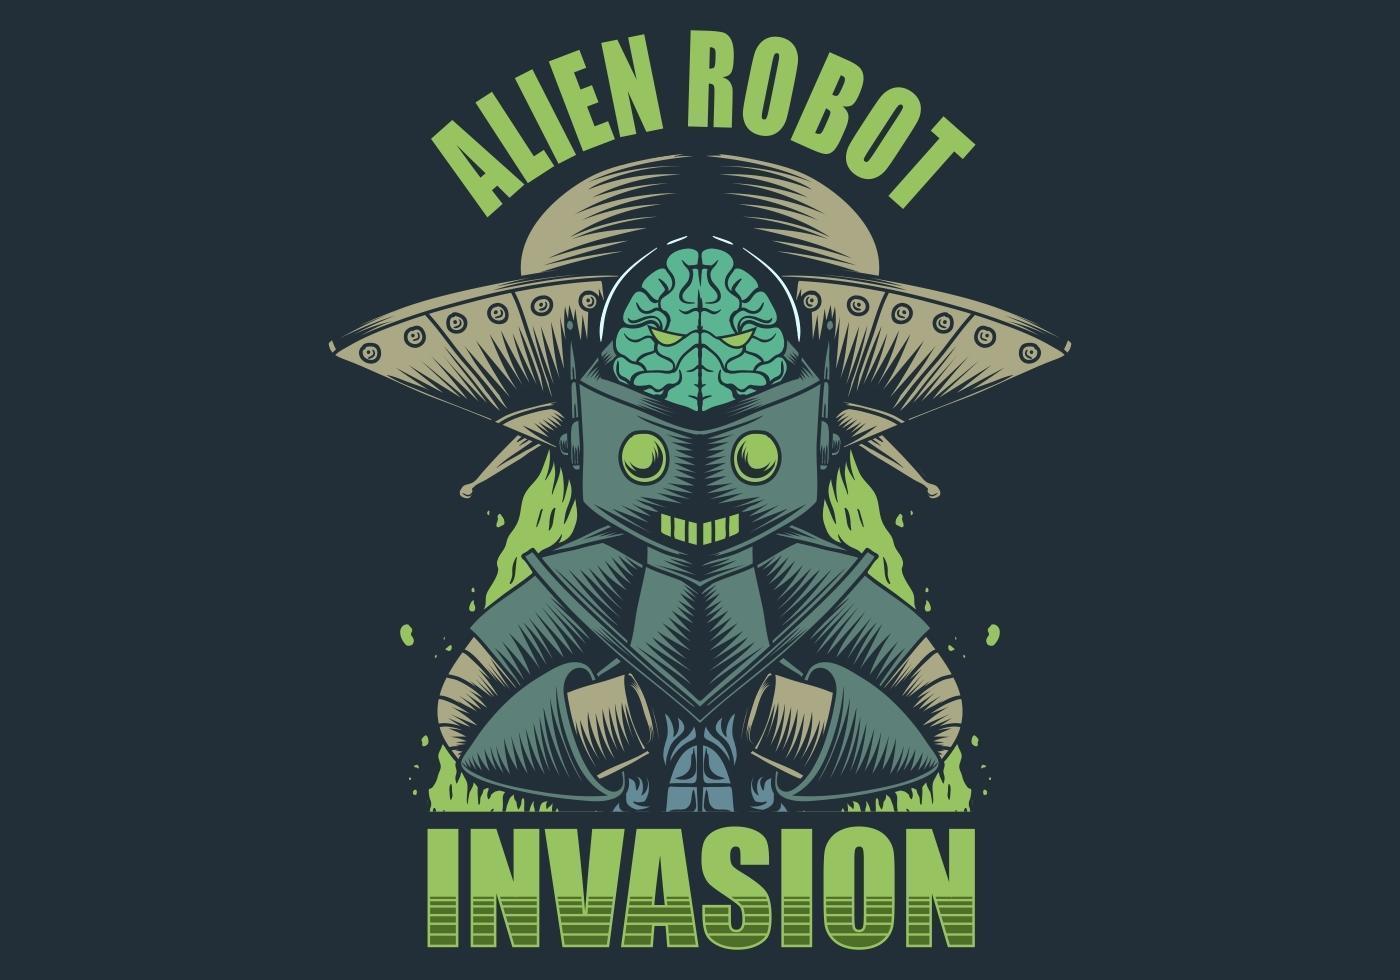 Alien Robot Invasion Illustration vector